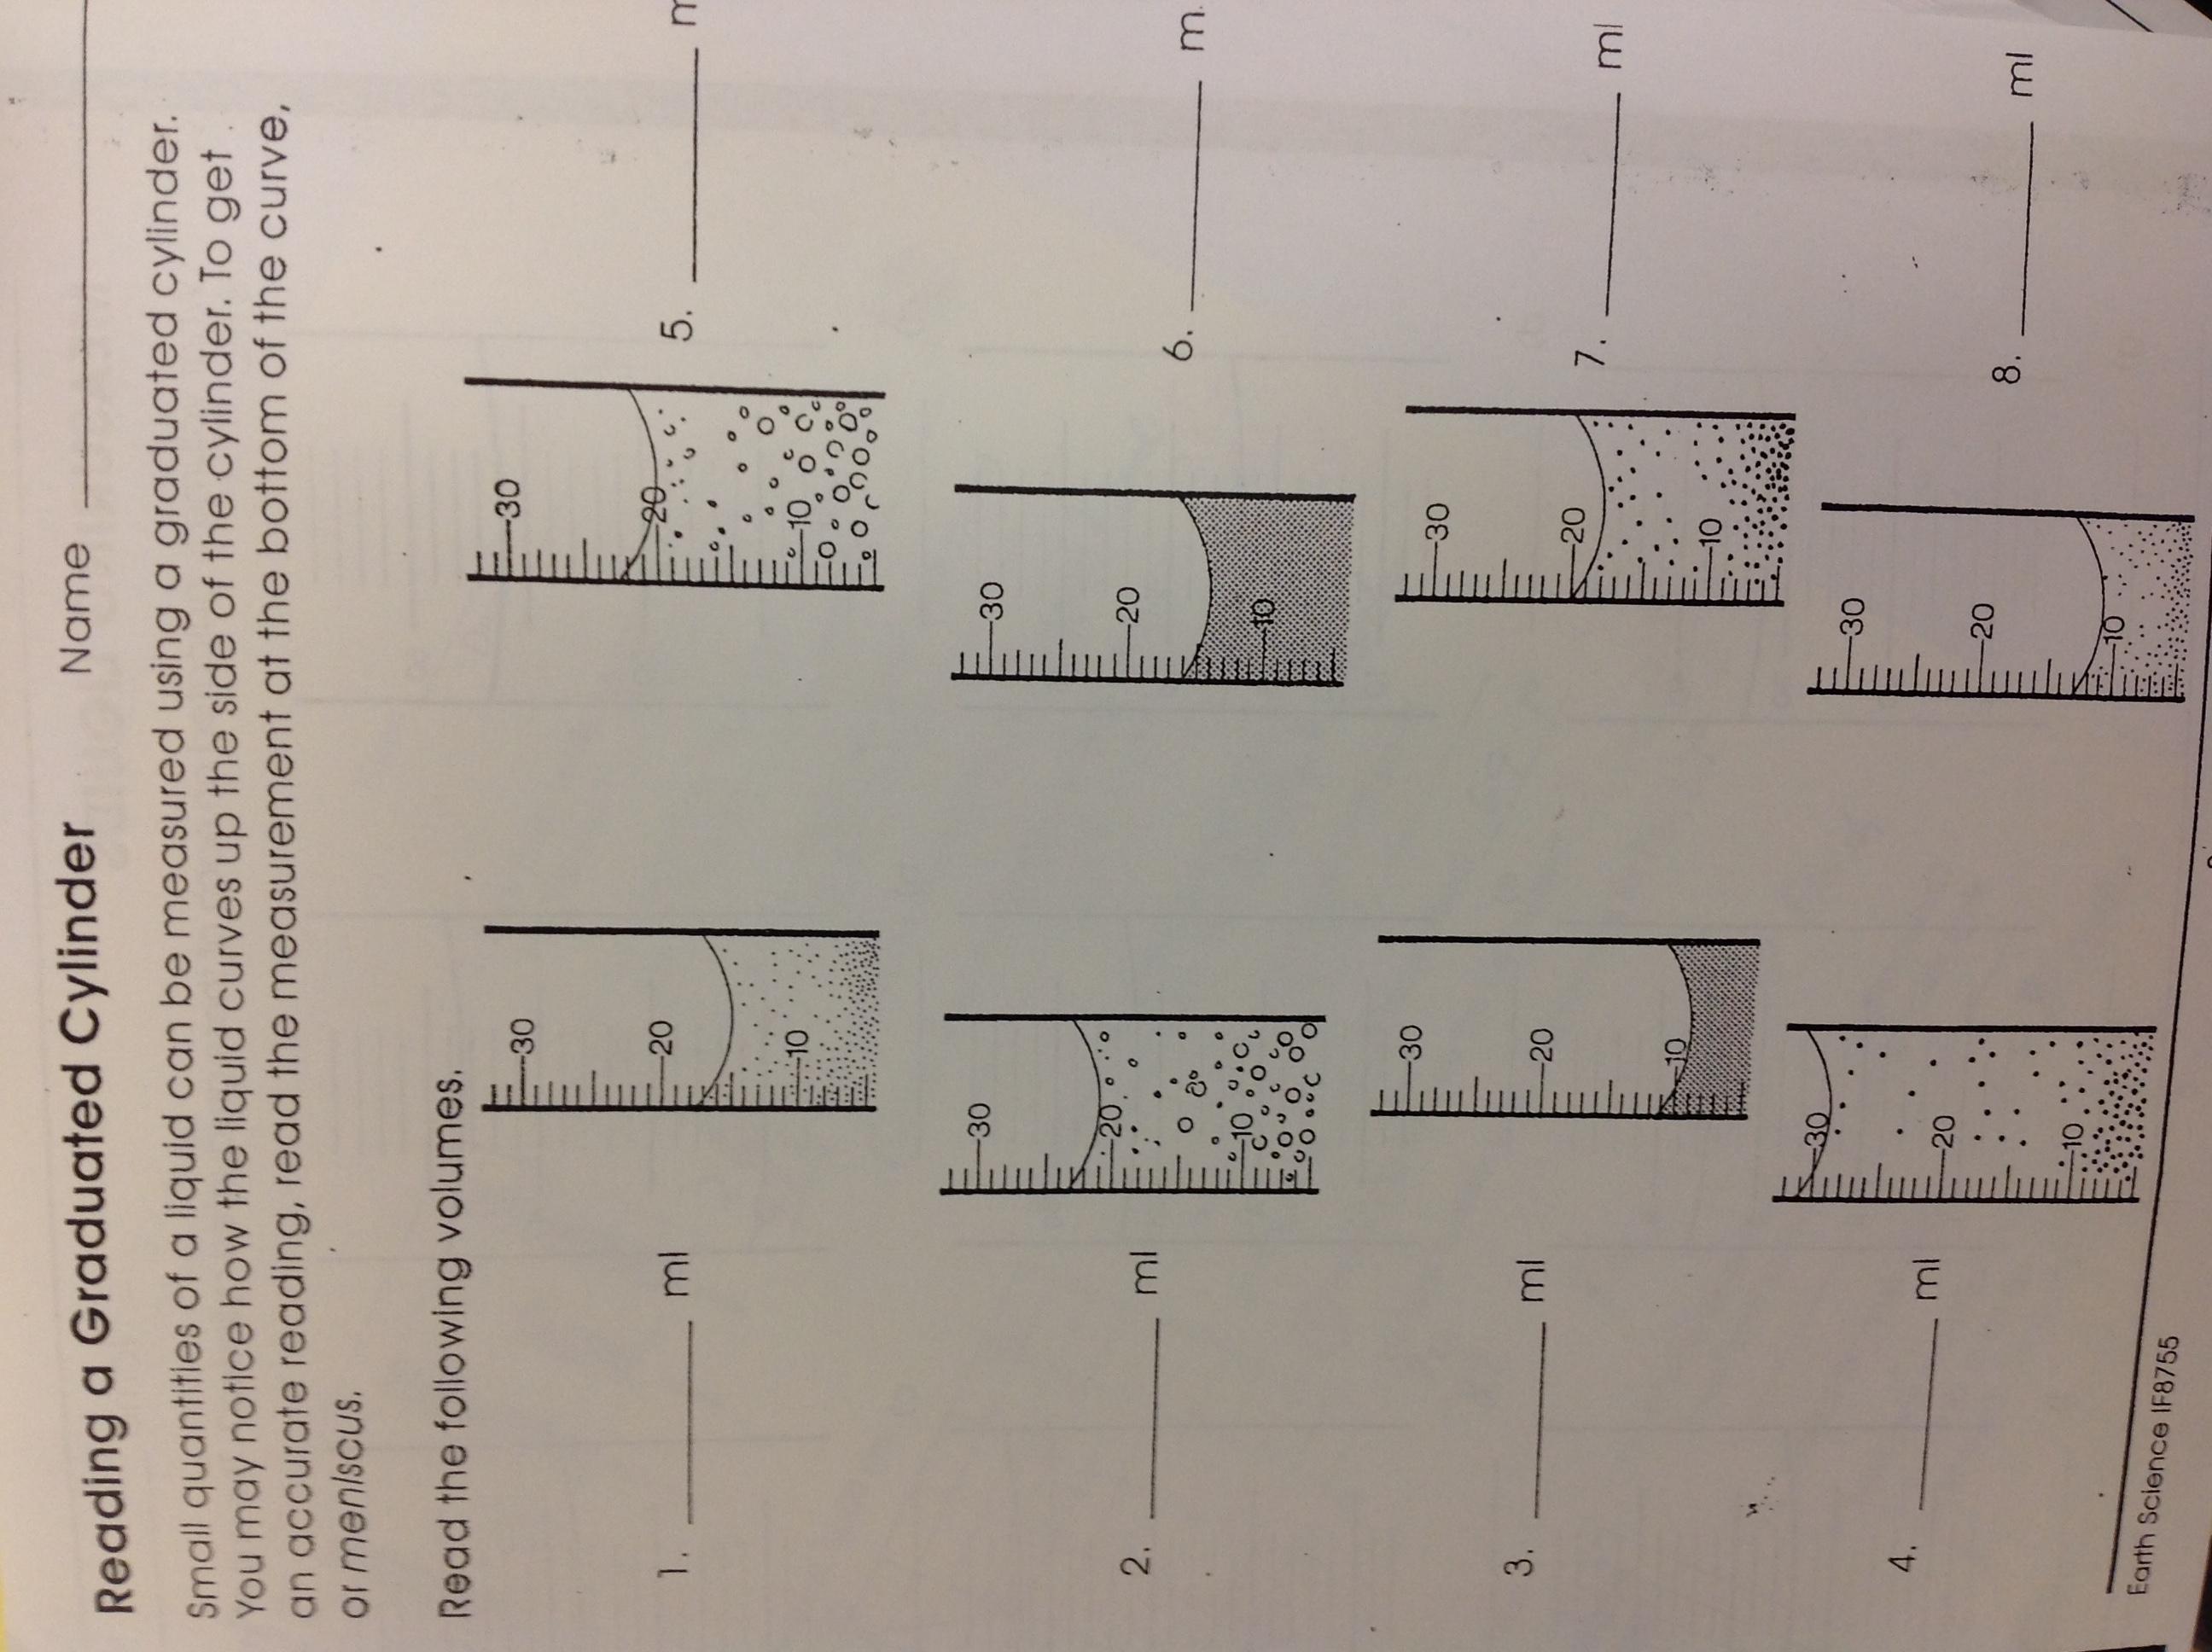 Lab Safety Scientific Method Metric System